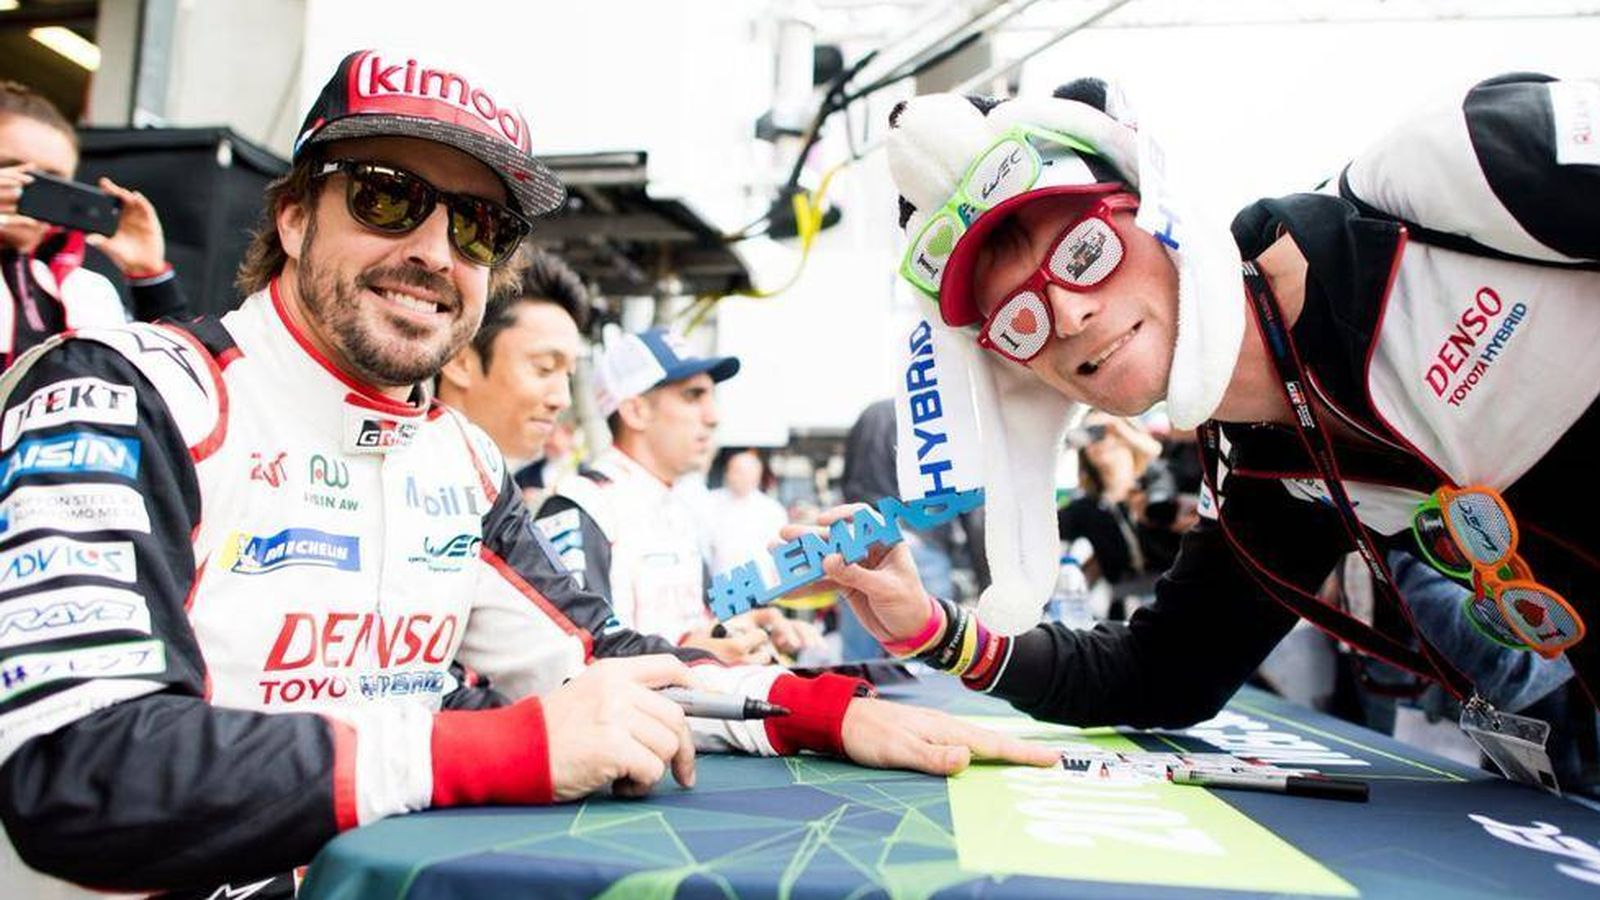 Foto: Alonso, en Le Mans. (Twitter)